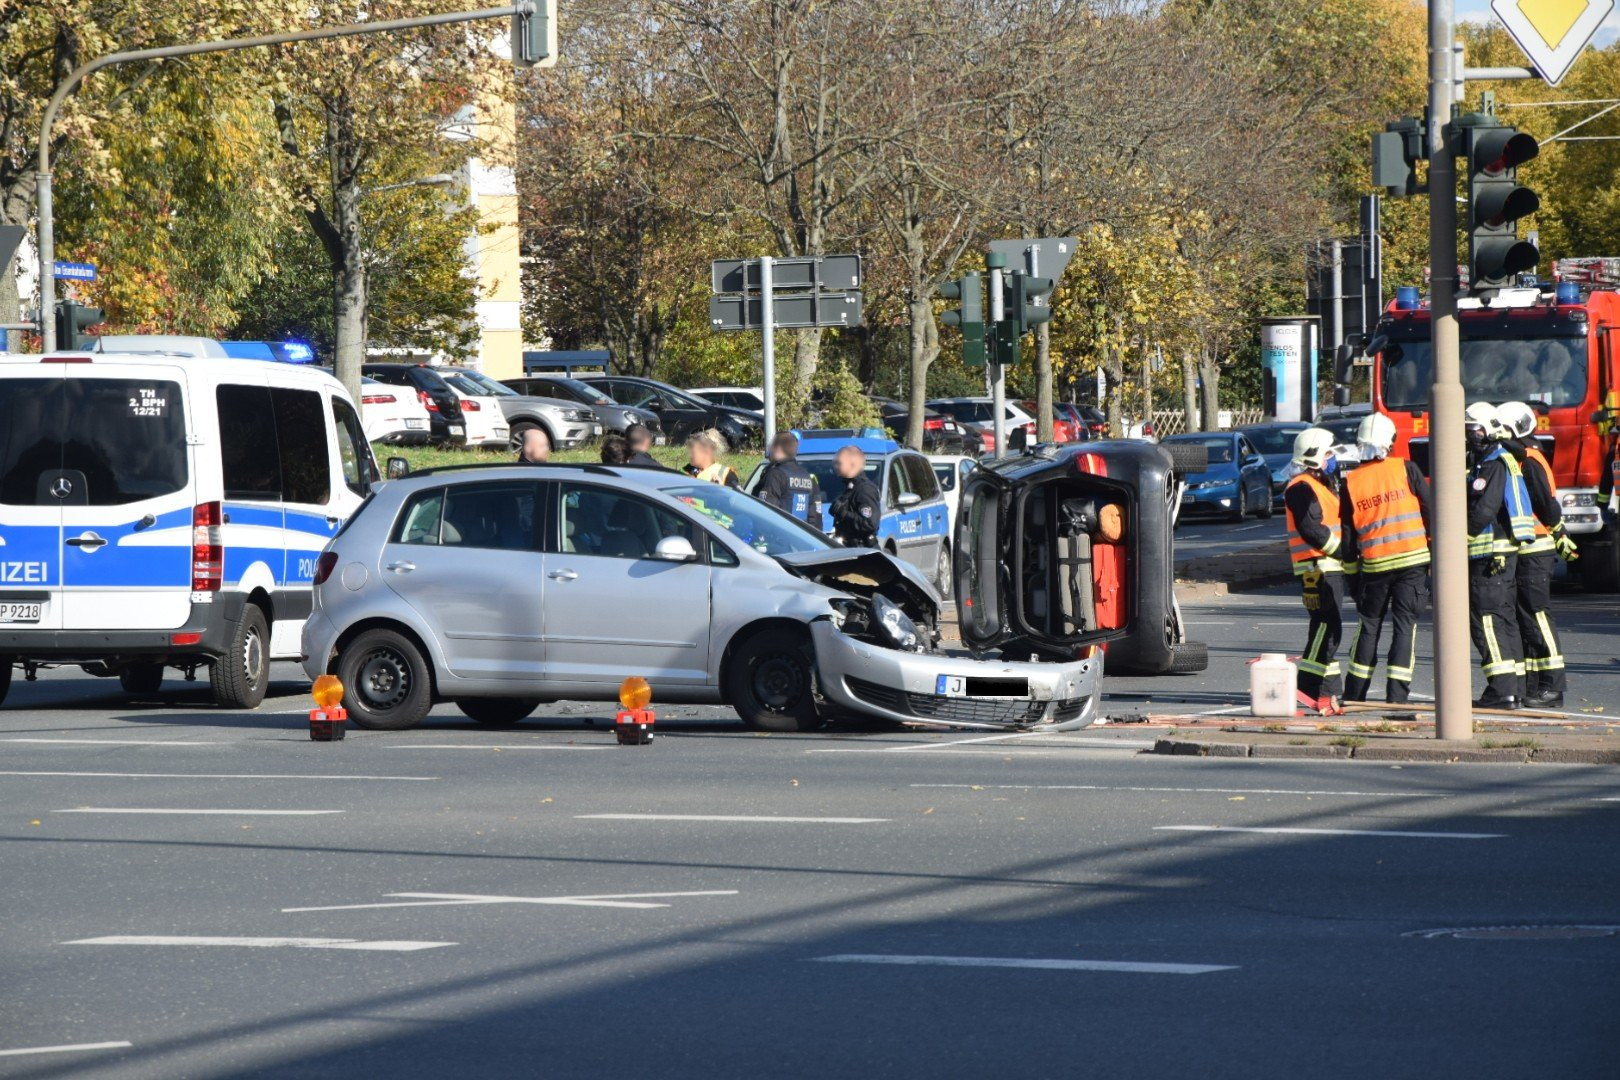 Autounfall mit umgekipptem Mercedes im Stadtzentrum